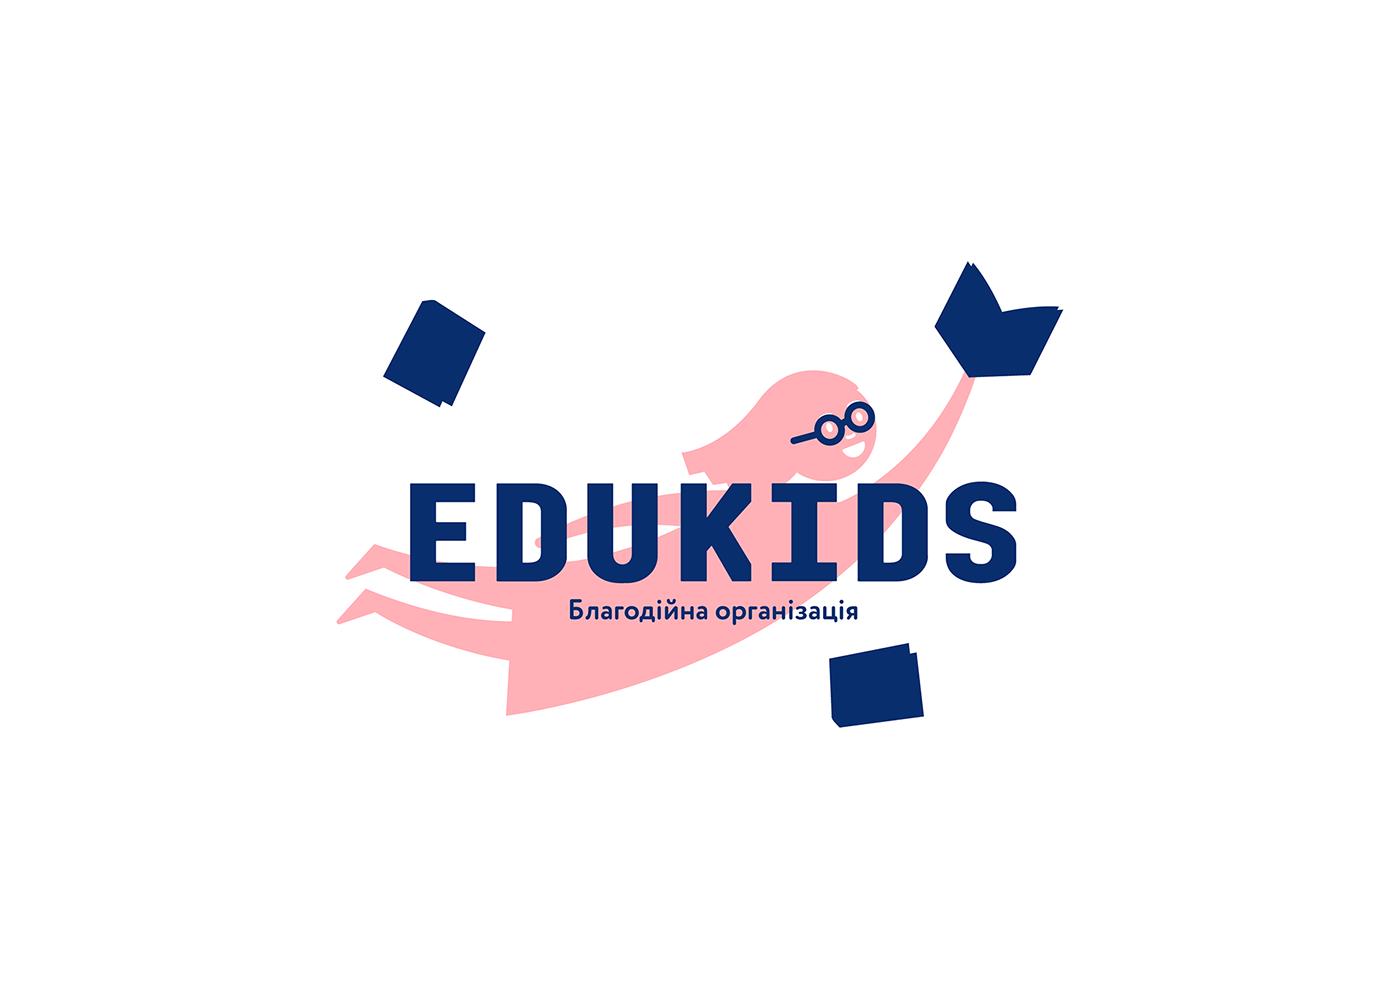 charity school Education UI ux Edukids children